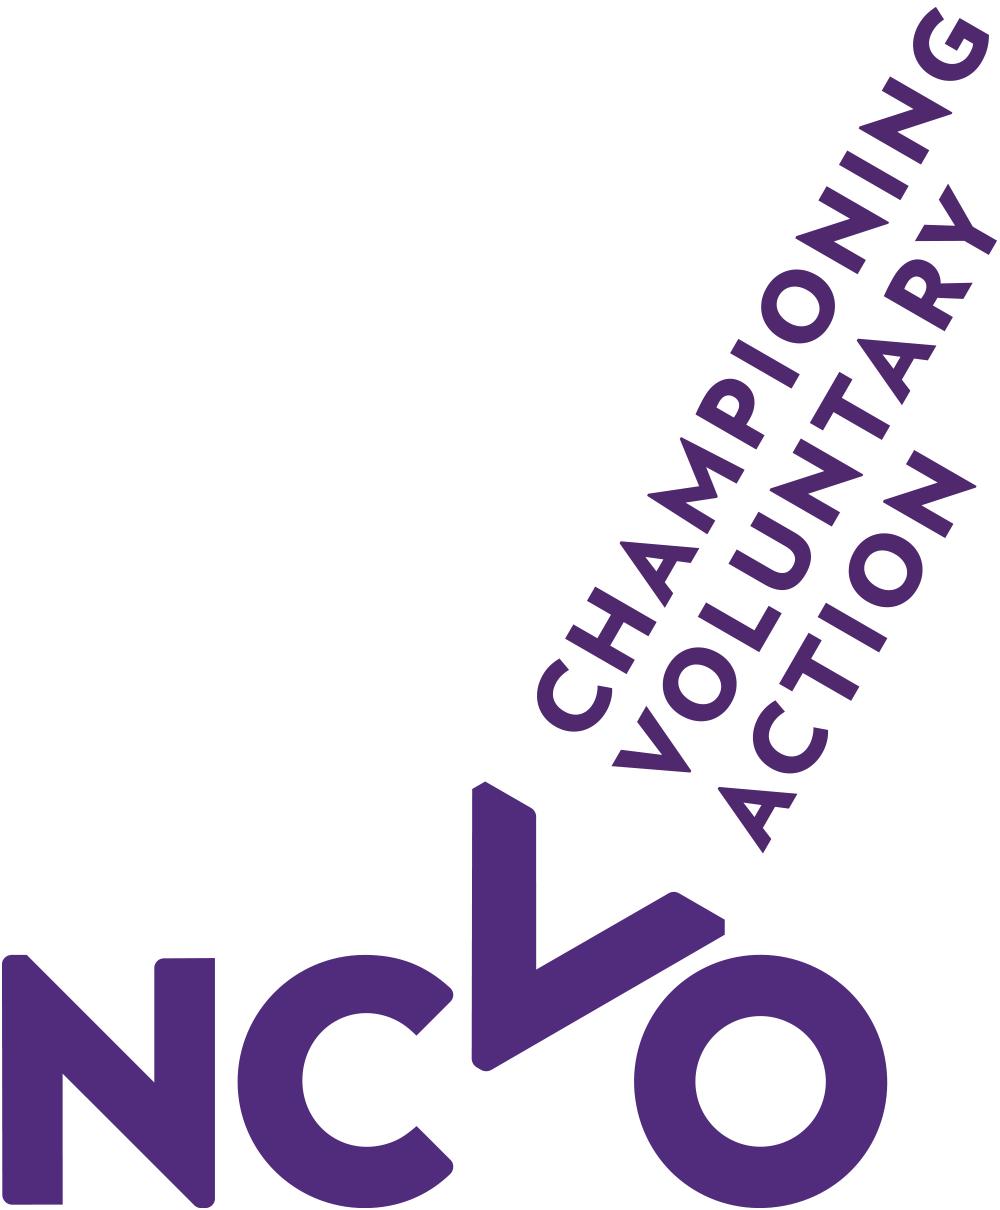 ncvo_logo_detail.png